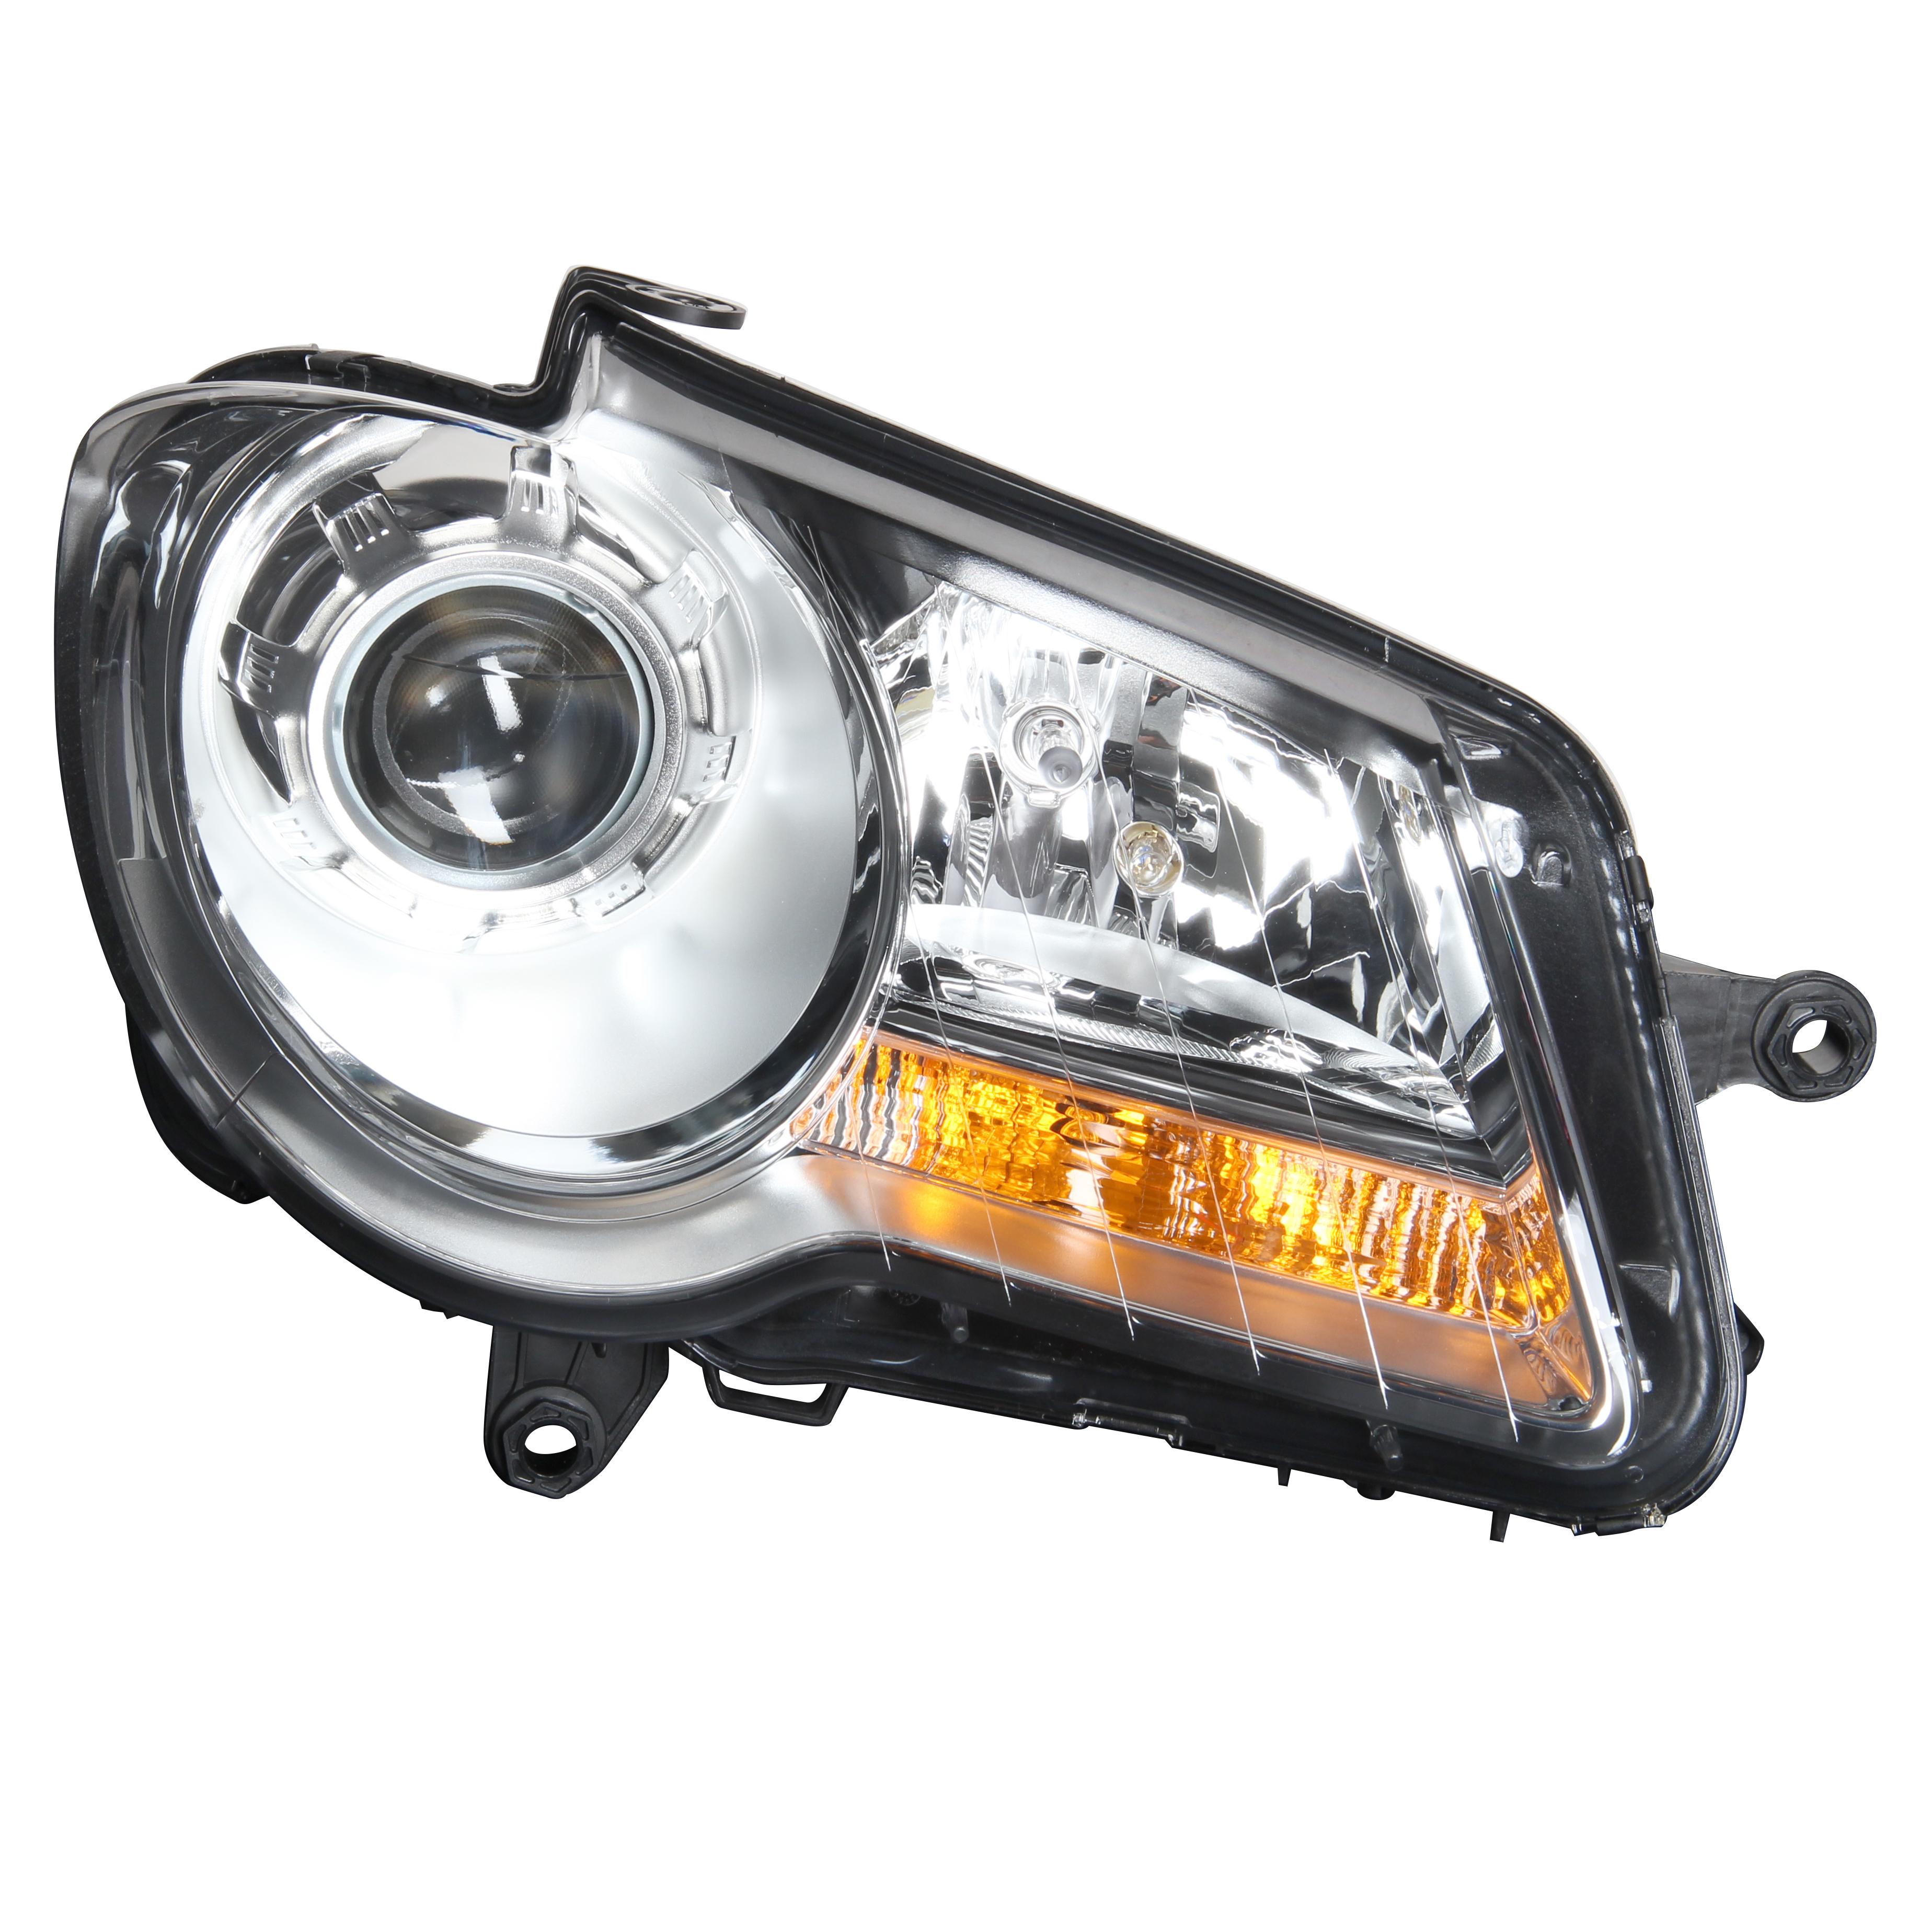 VW Touran Clear Halogen Xenon HID Parking Beam Side Light Bulbs